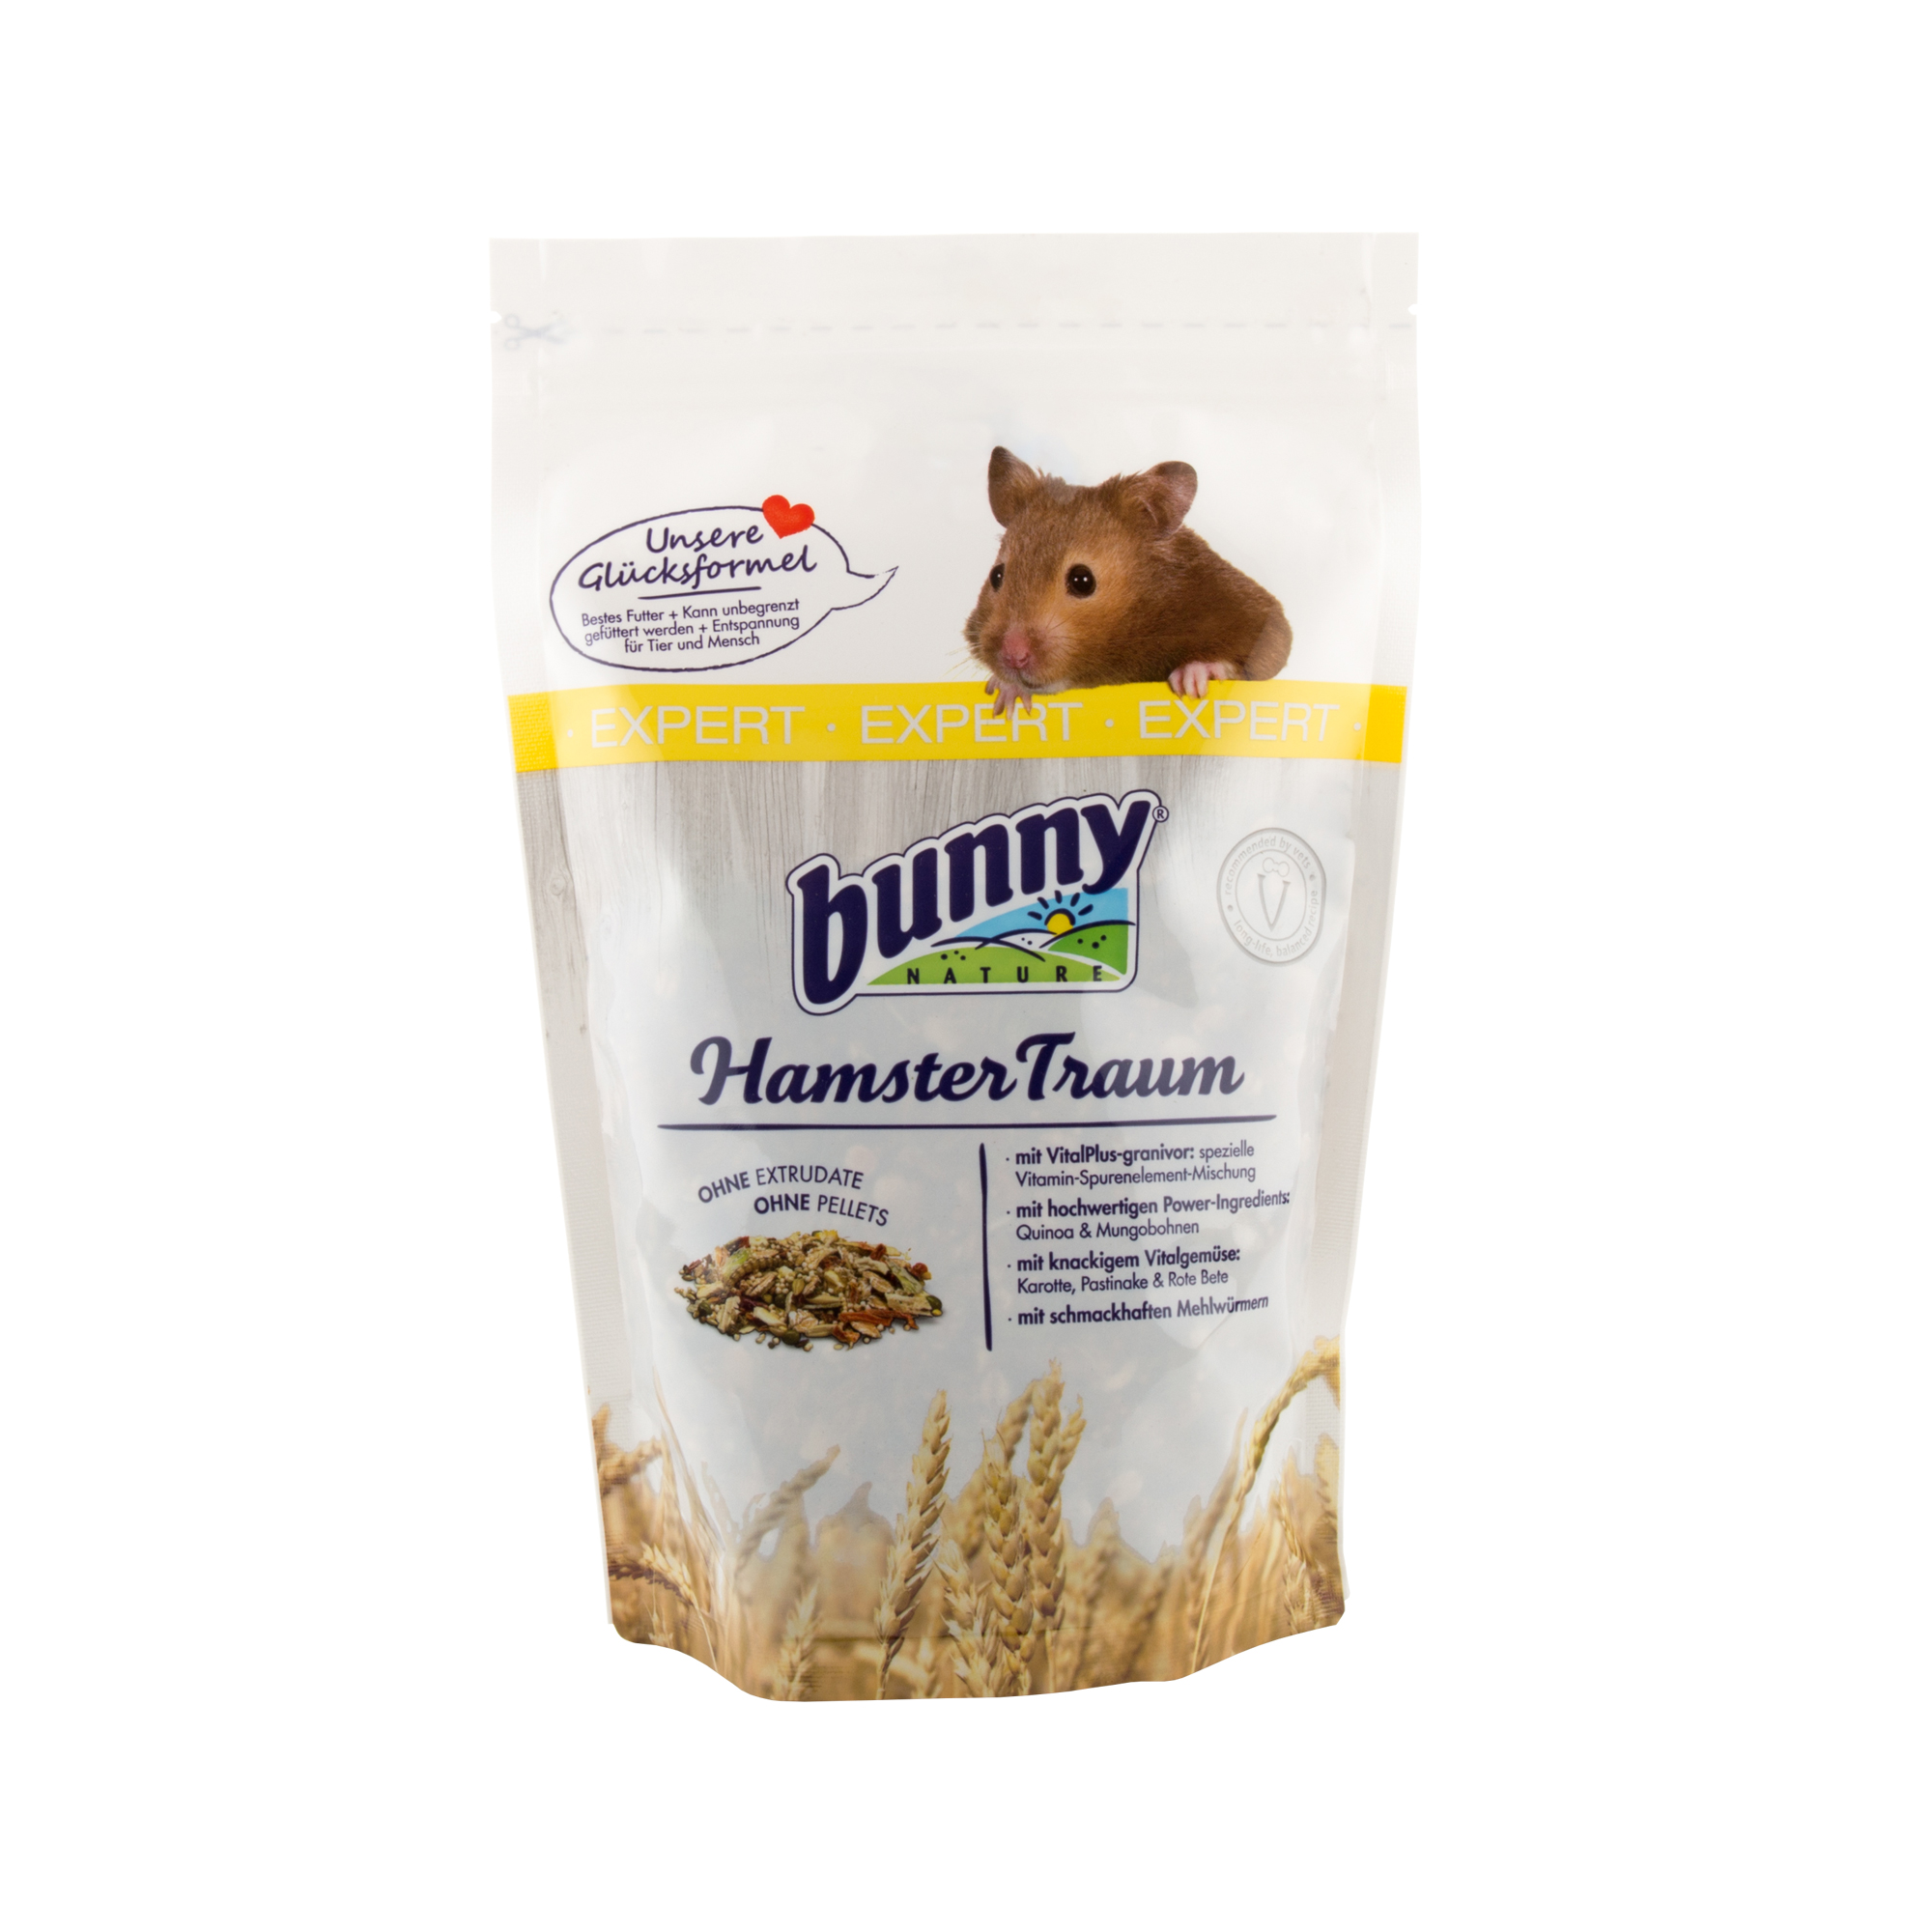 Bunny Nature HamsterTraum Expert